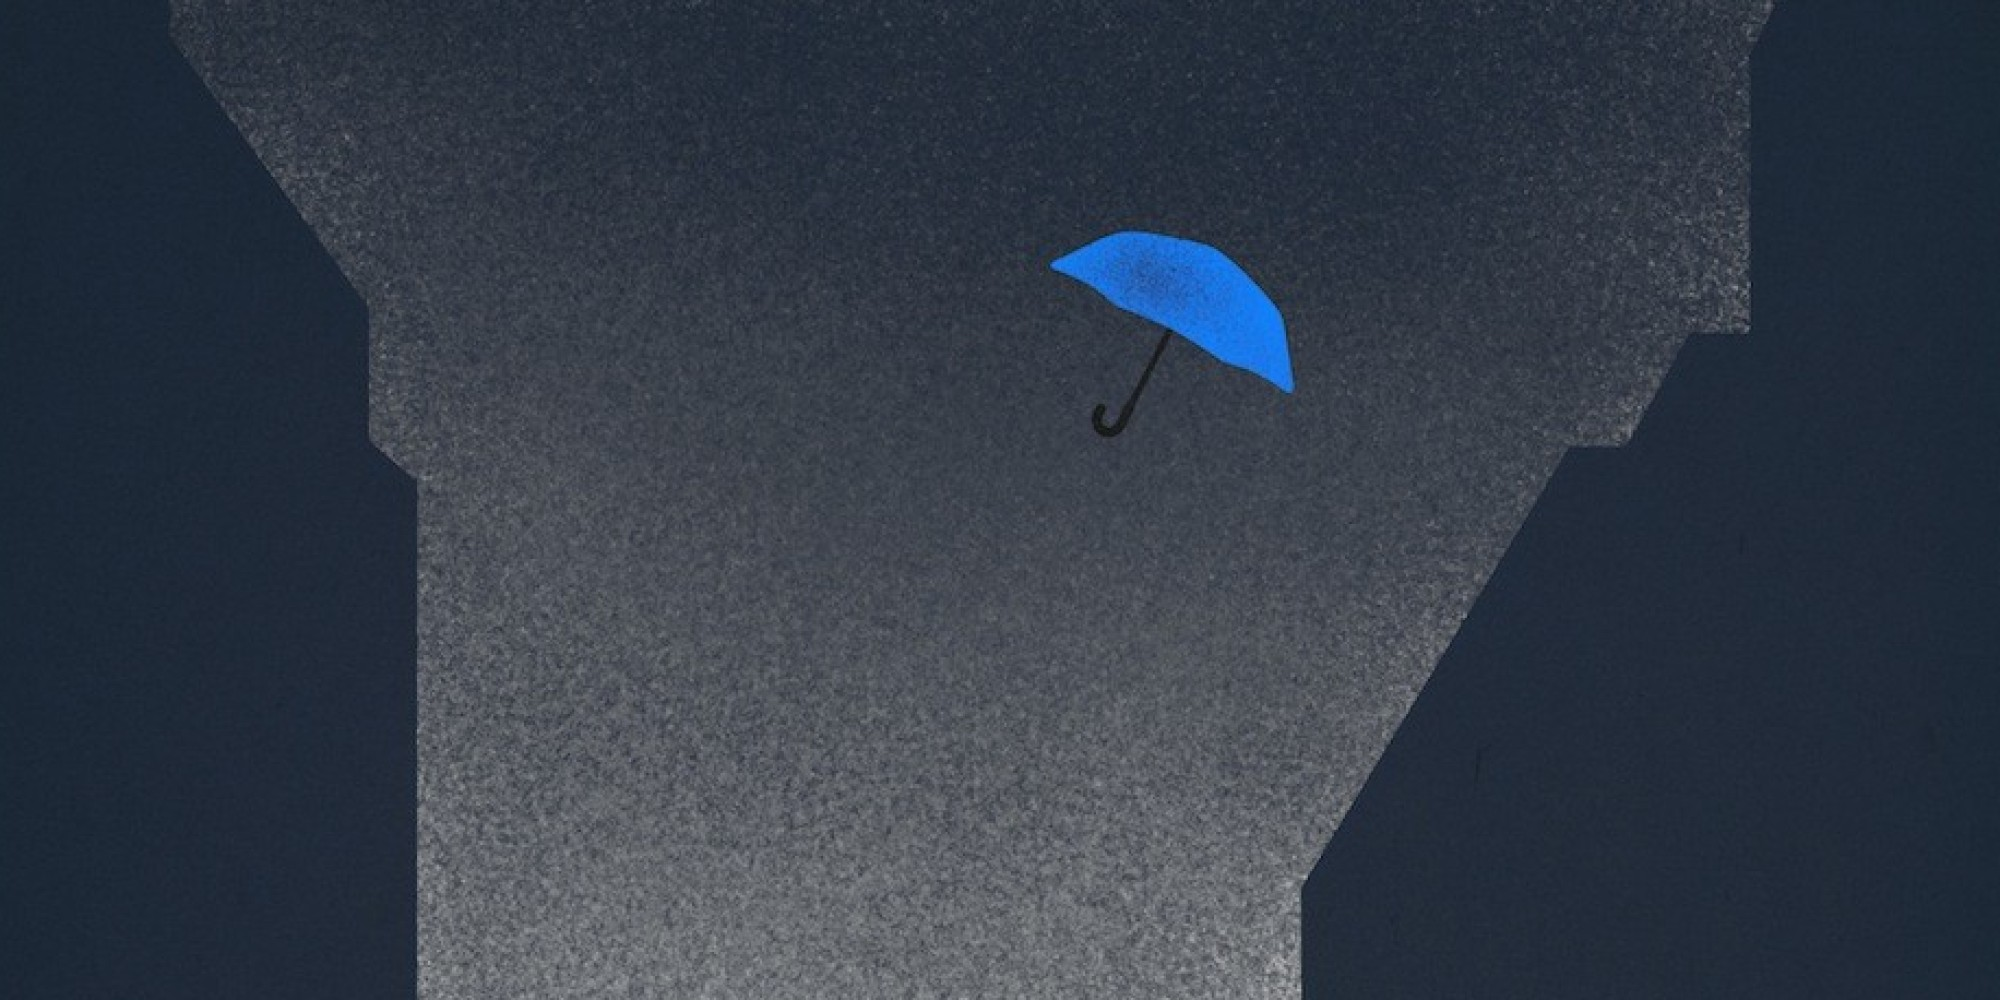 Blue Umbrella Painting Blue Umbrella' For Pixar